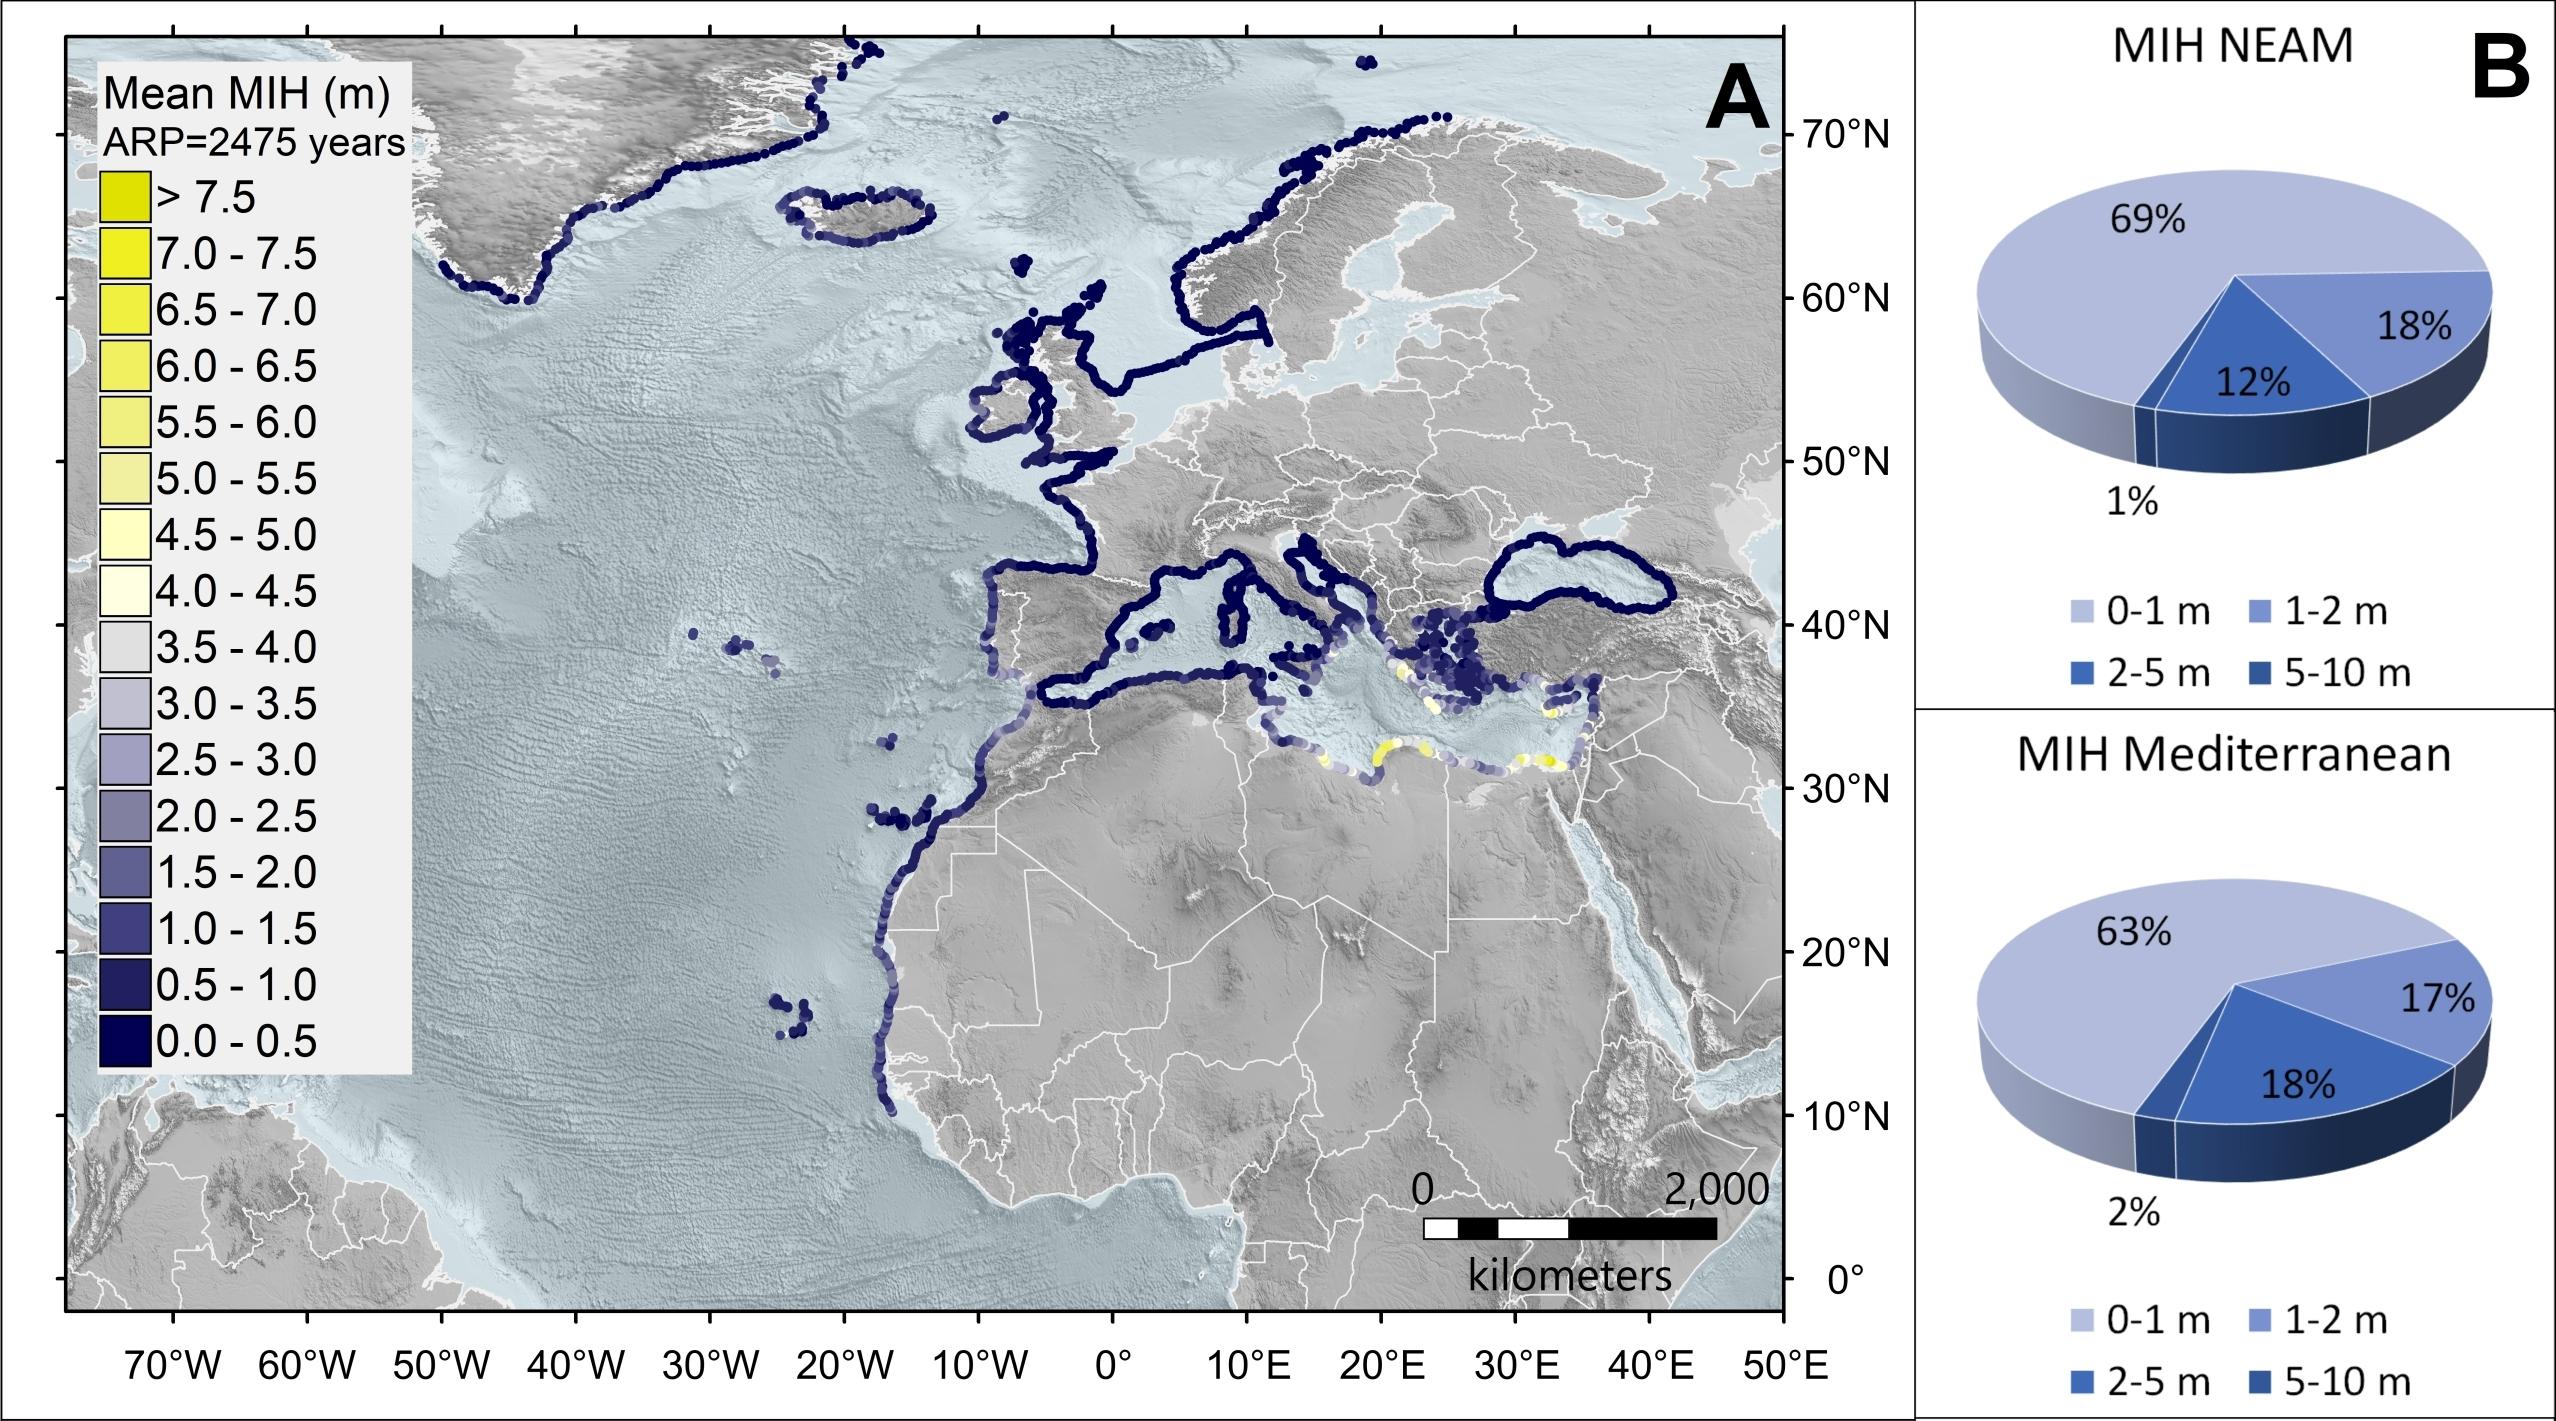 The Making of the NEAM Tsunami Hazard Model 2018 (NEAMTHM18)